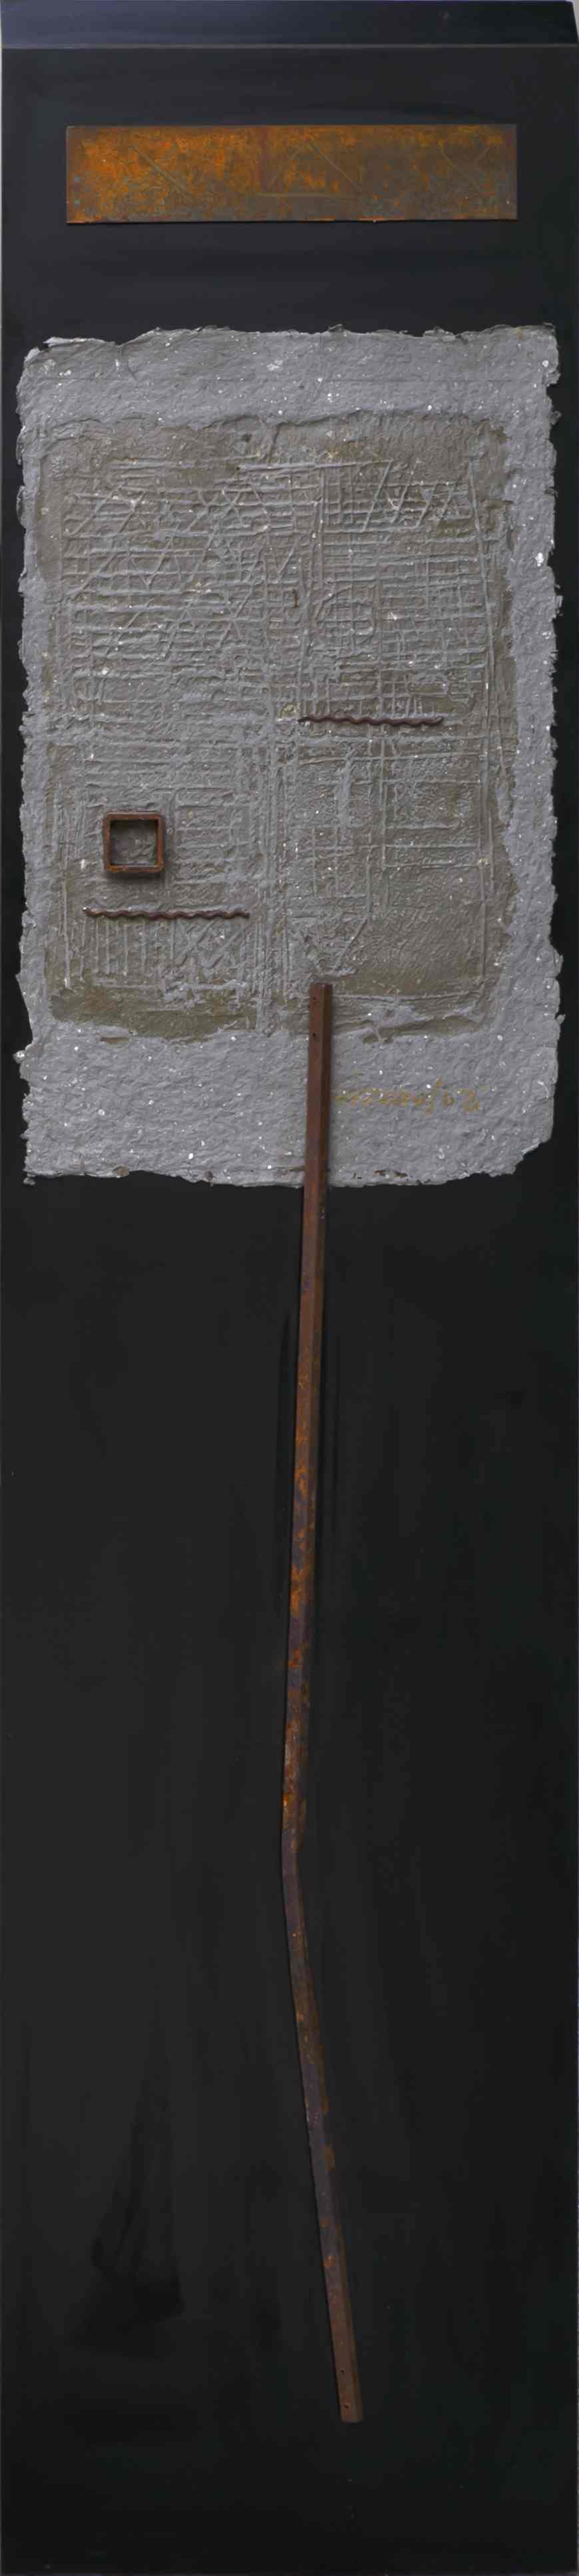 Stele n°2, ferro, grafica sperimentale su carta a mano, su tavola, 175x40, 2002